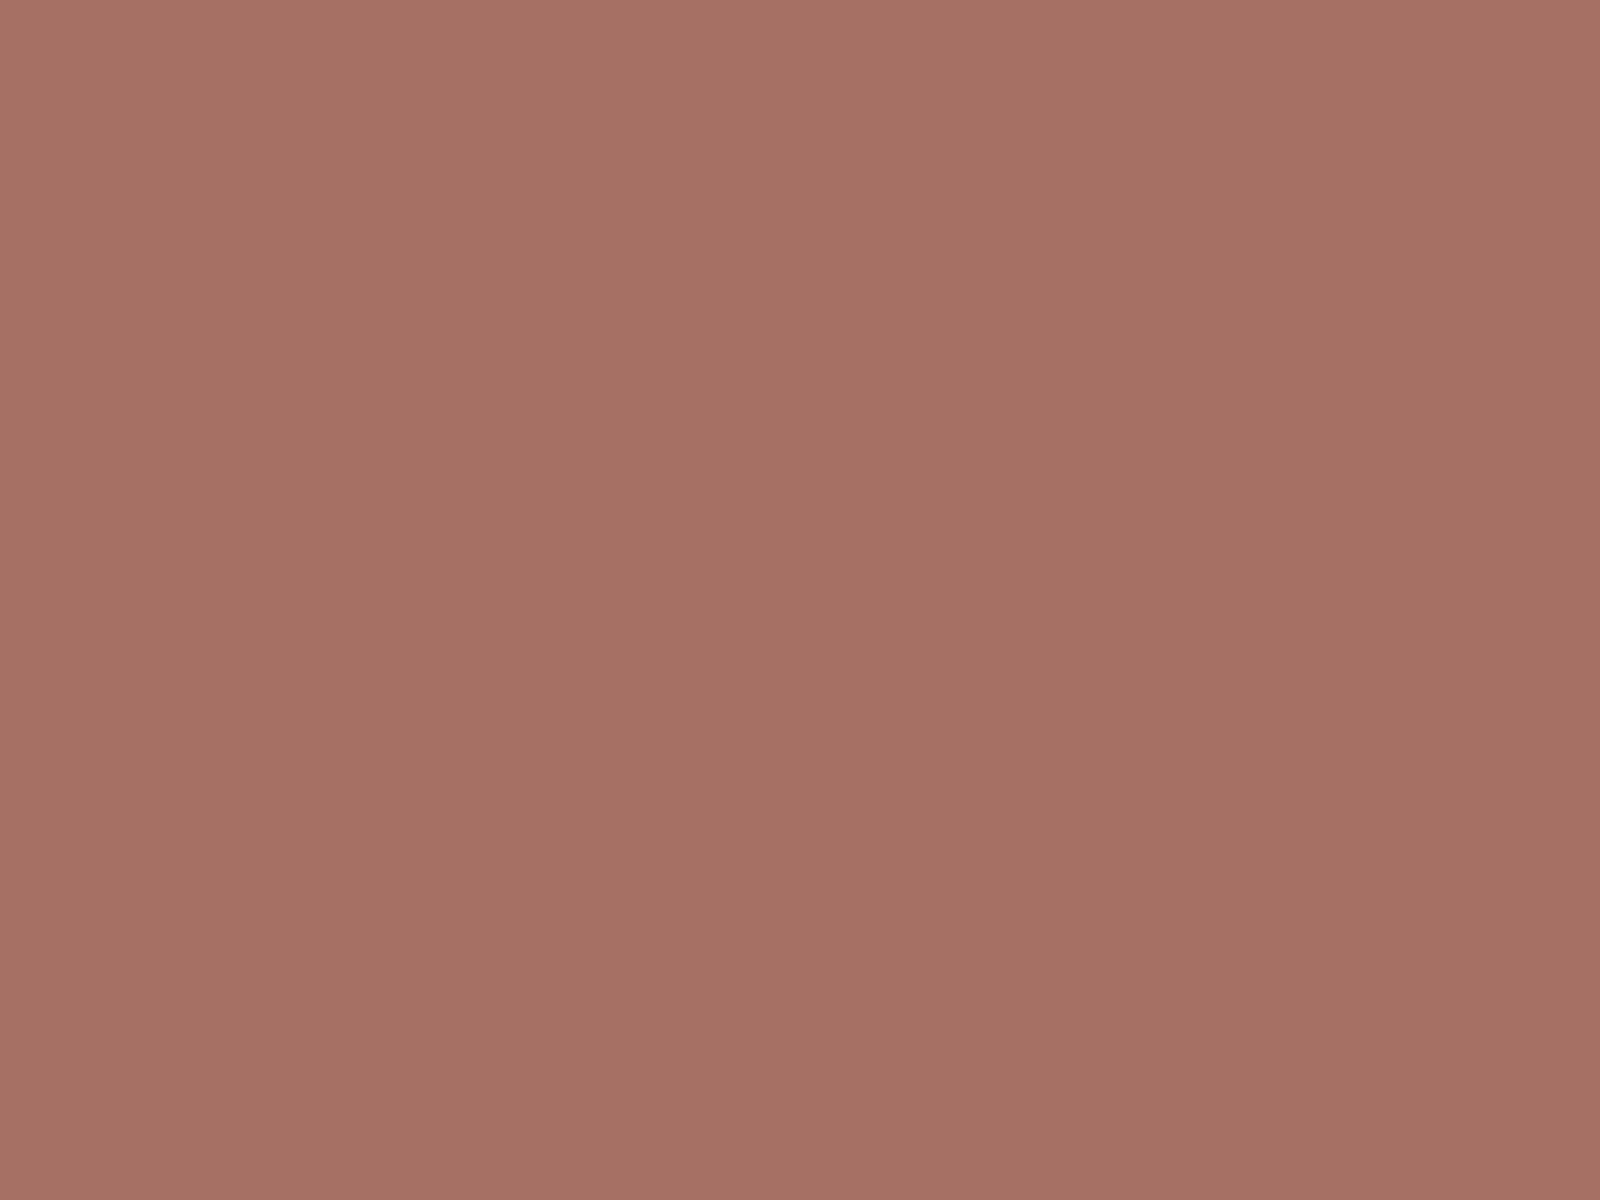 1600x1200 Blast-off Bronze Solid Color Background